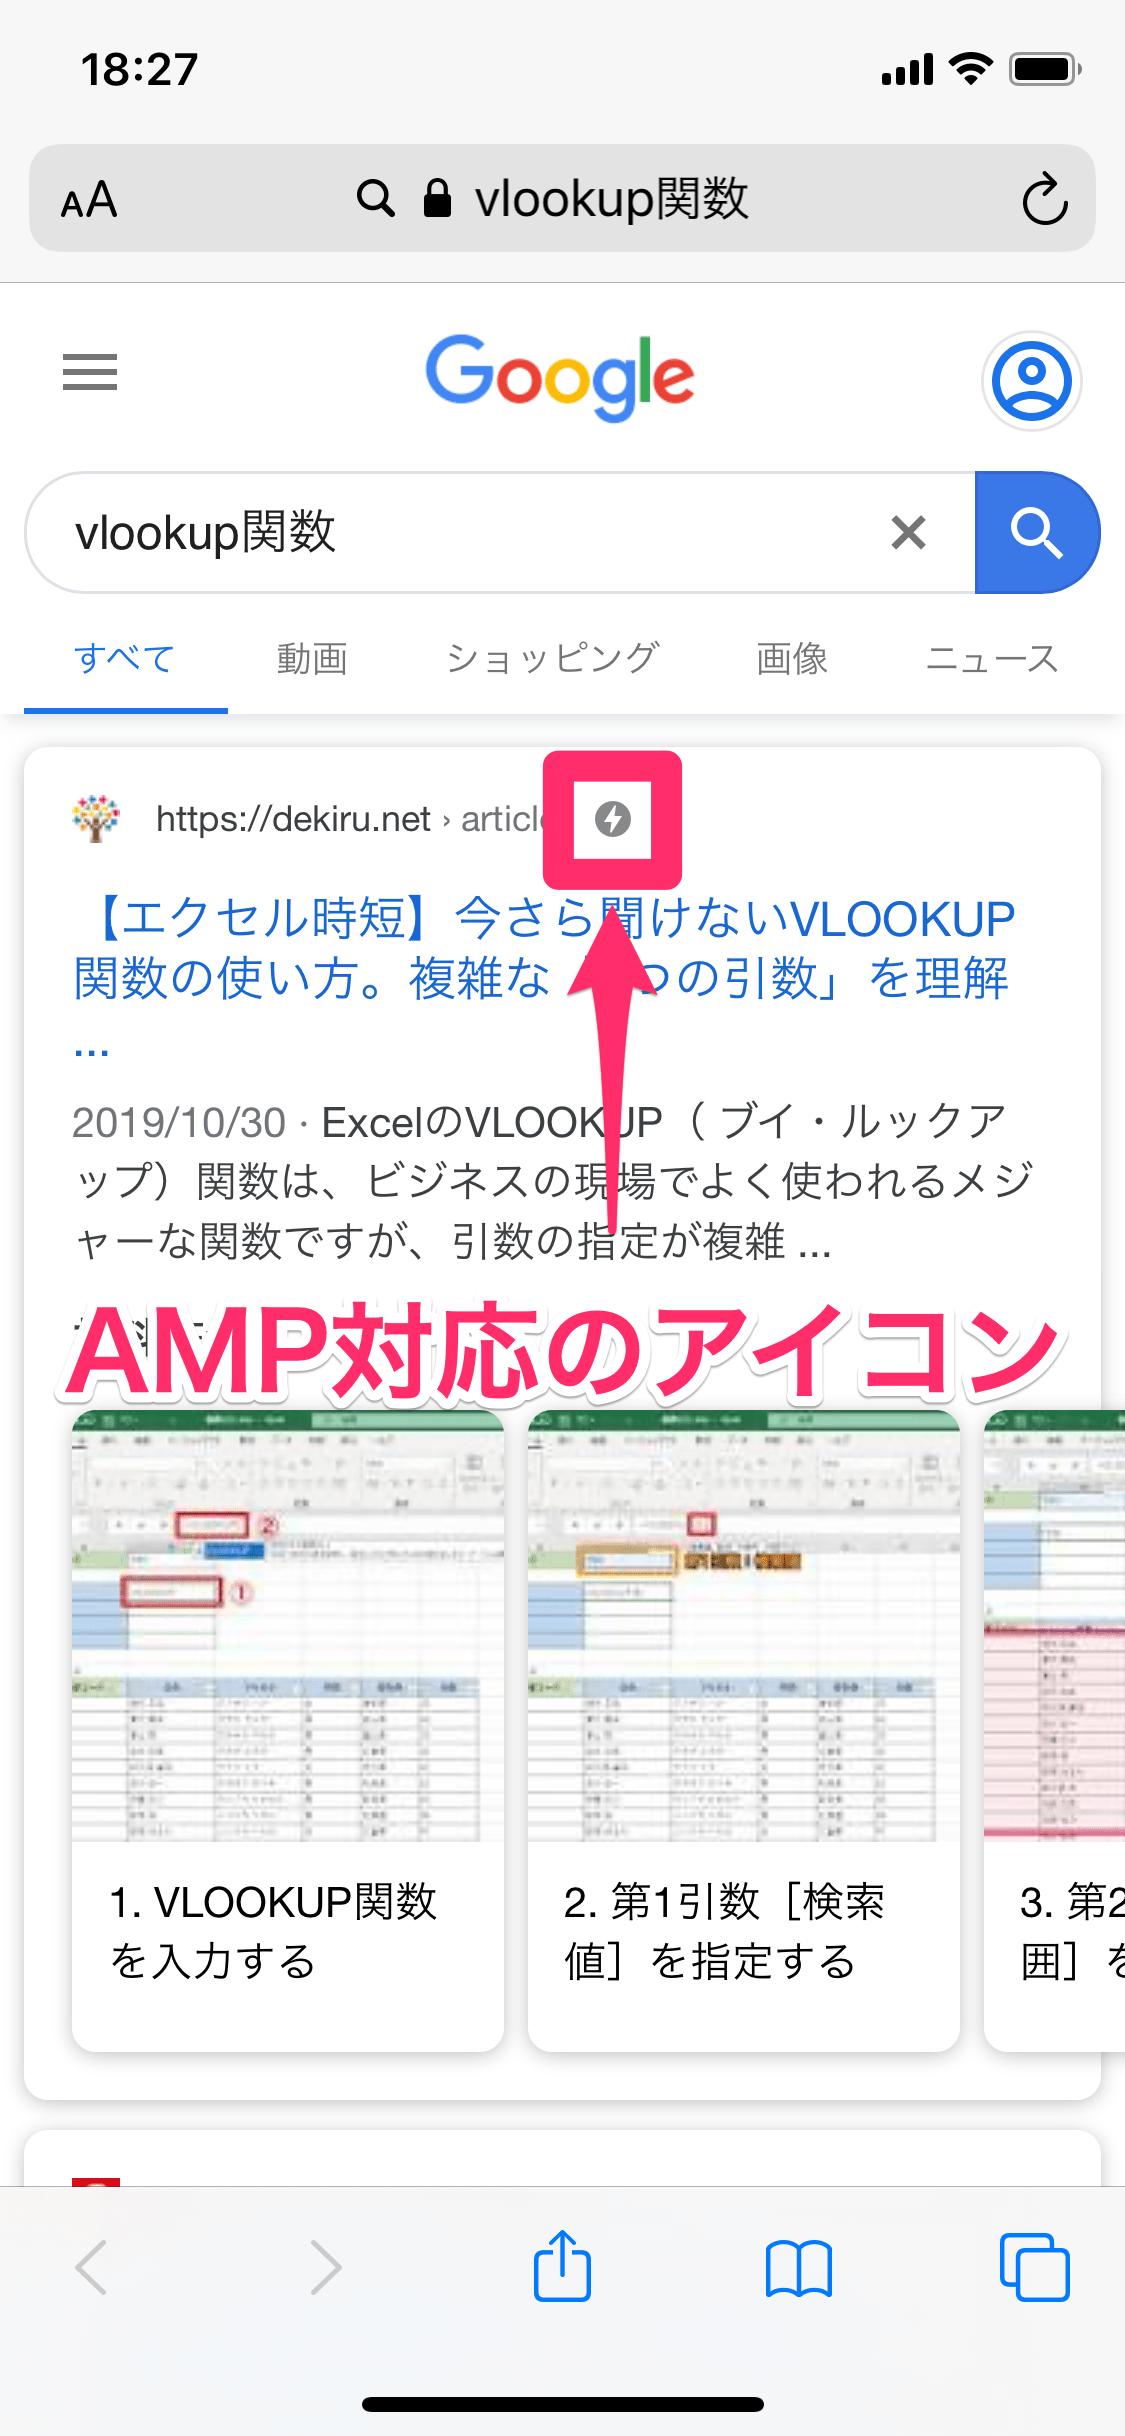 Safariのツールバーを常に非表示にする方法。画面を広くしてWebページを快適に見られる!